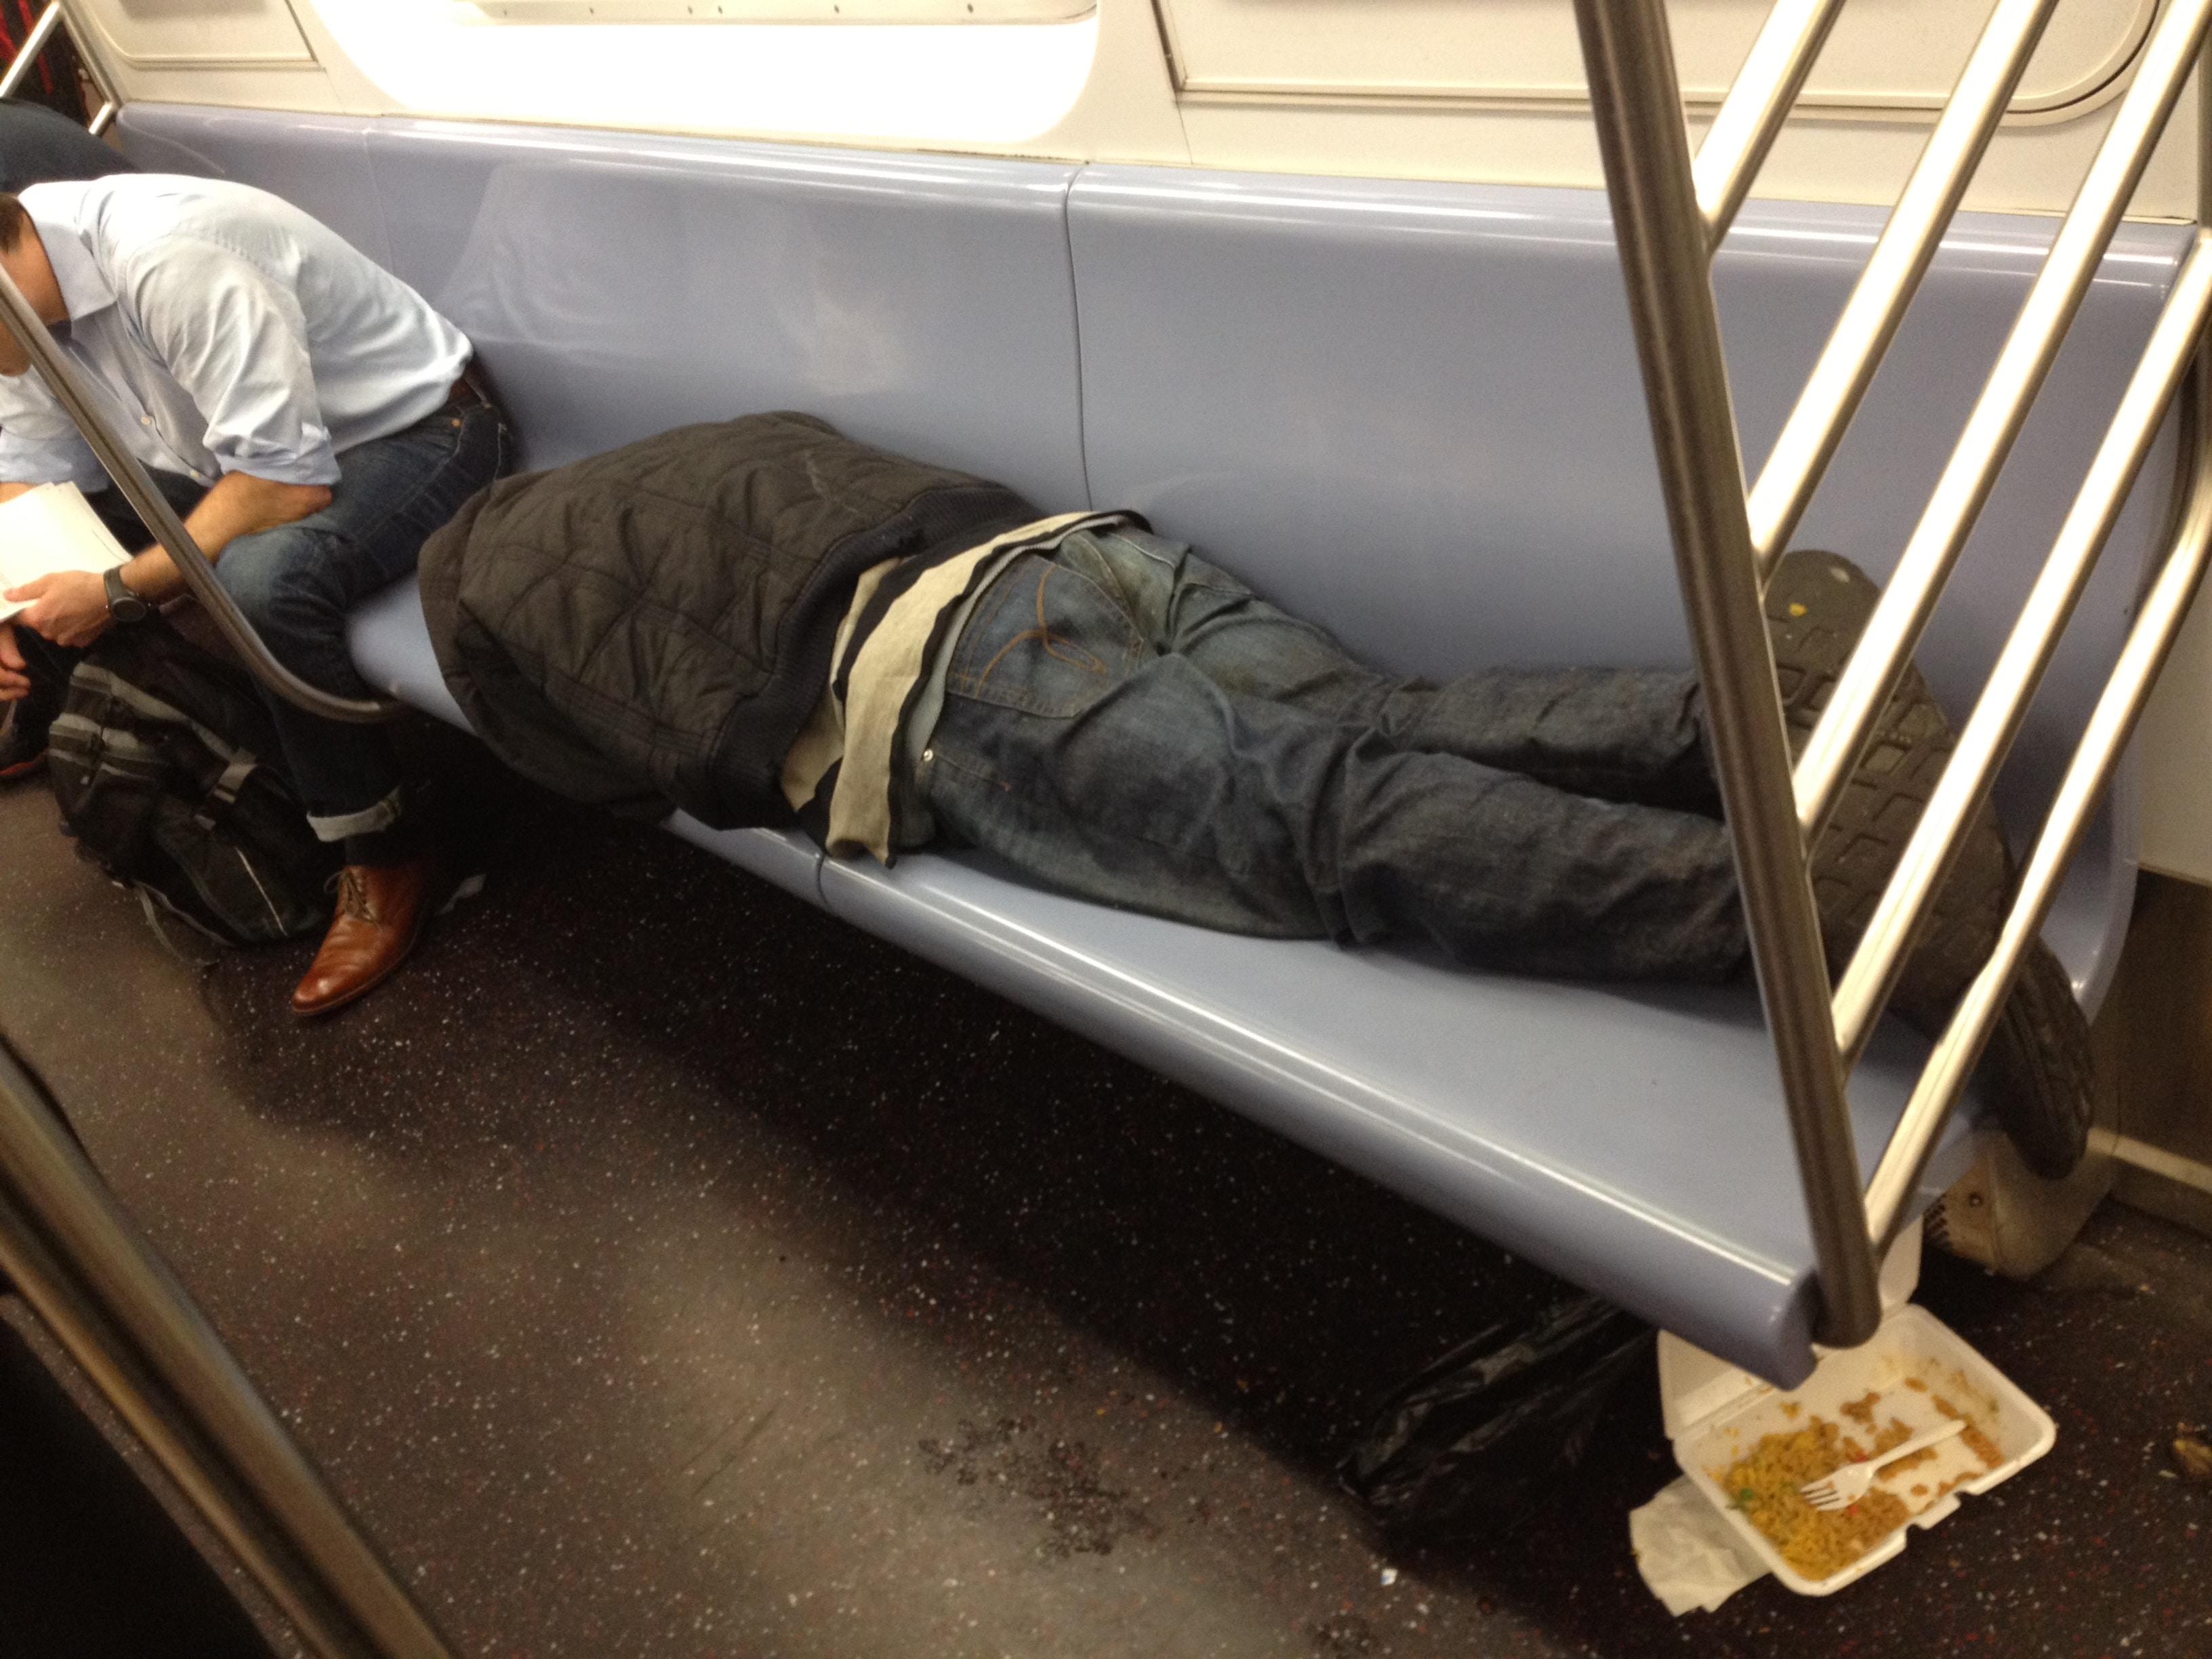 Homeless man on subway